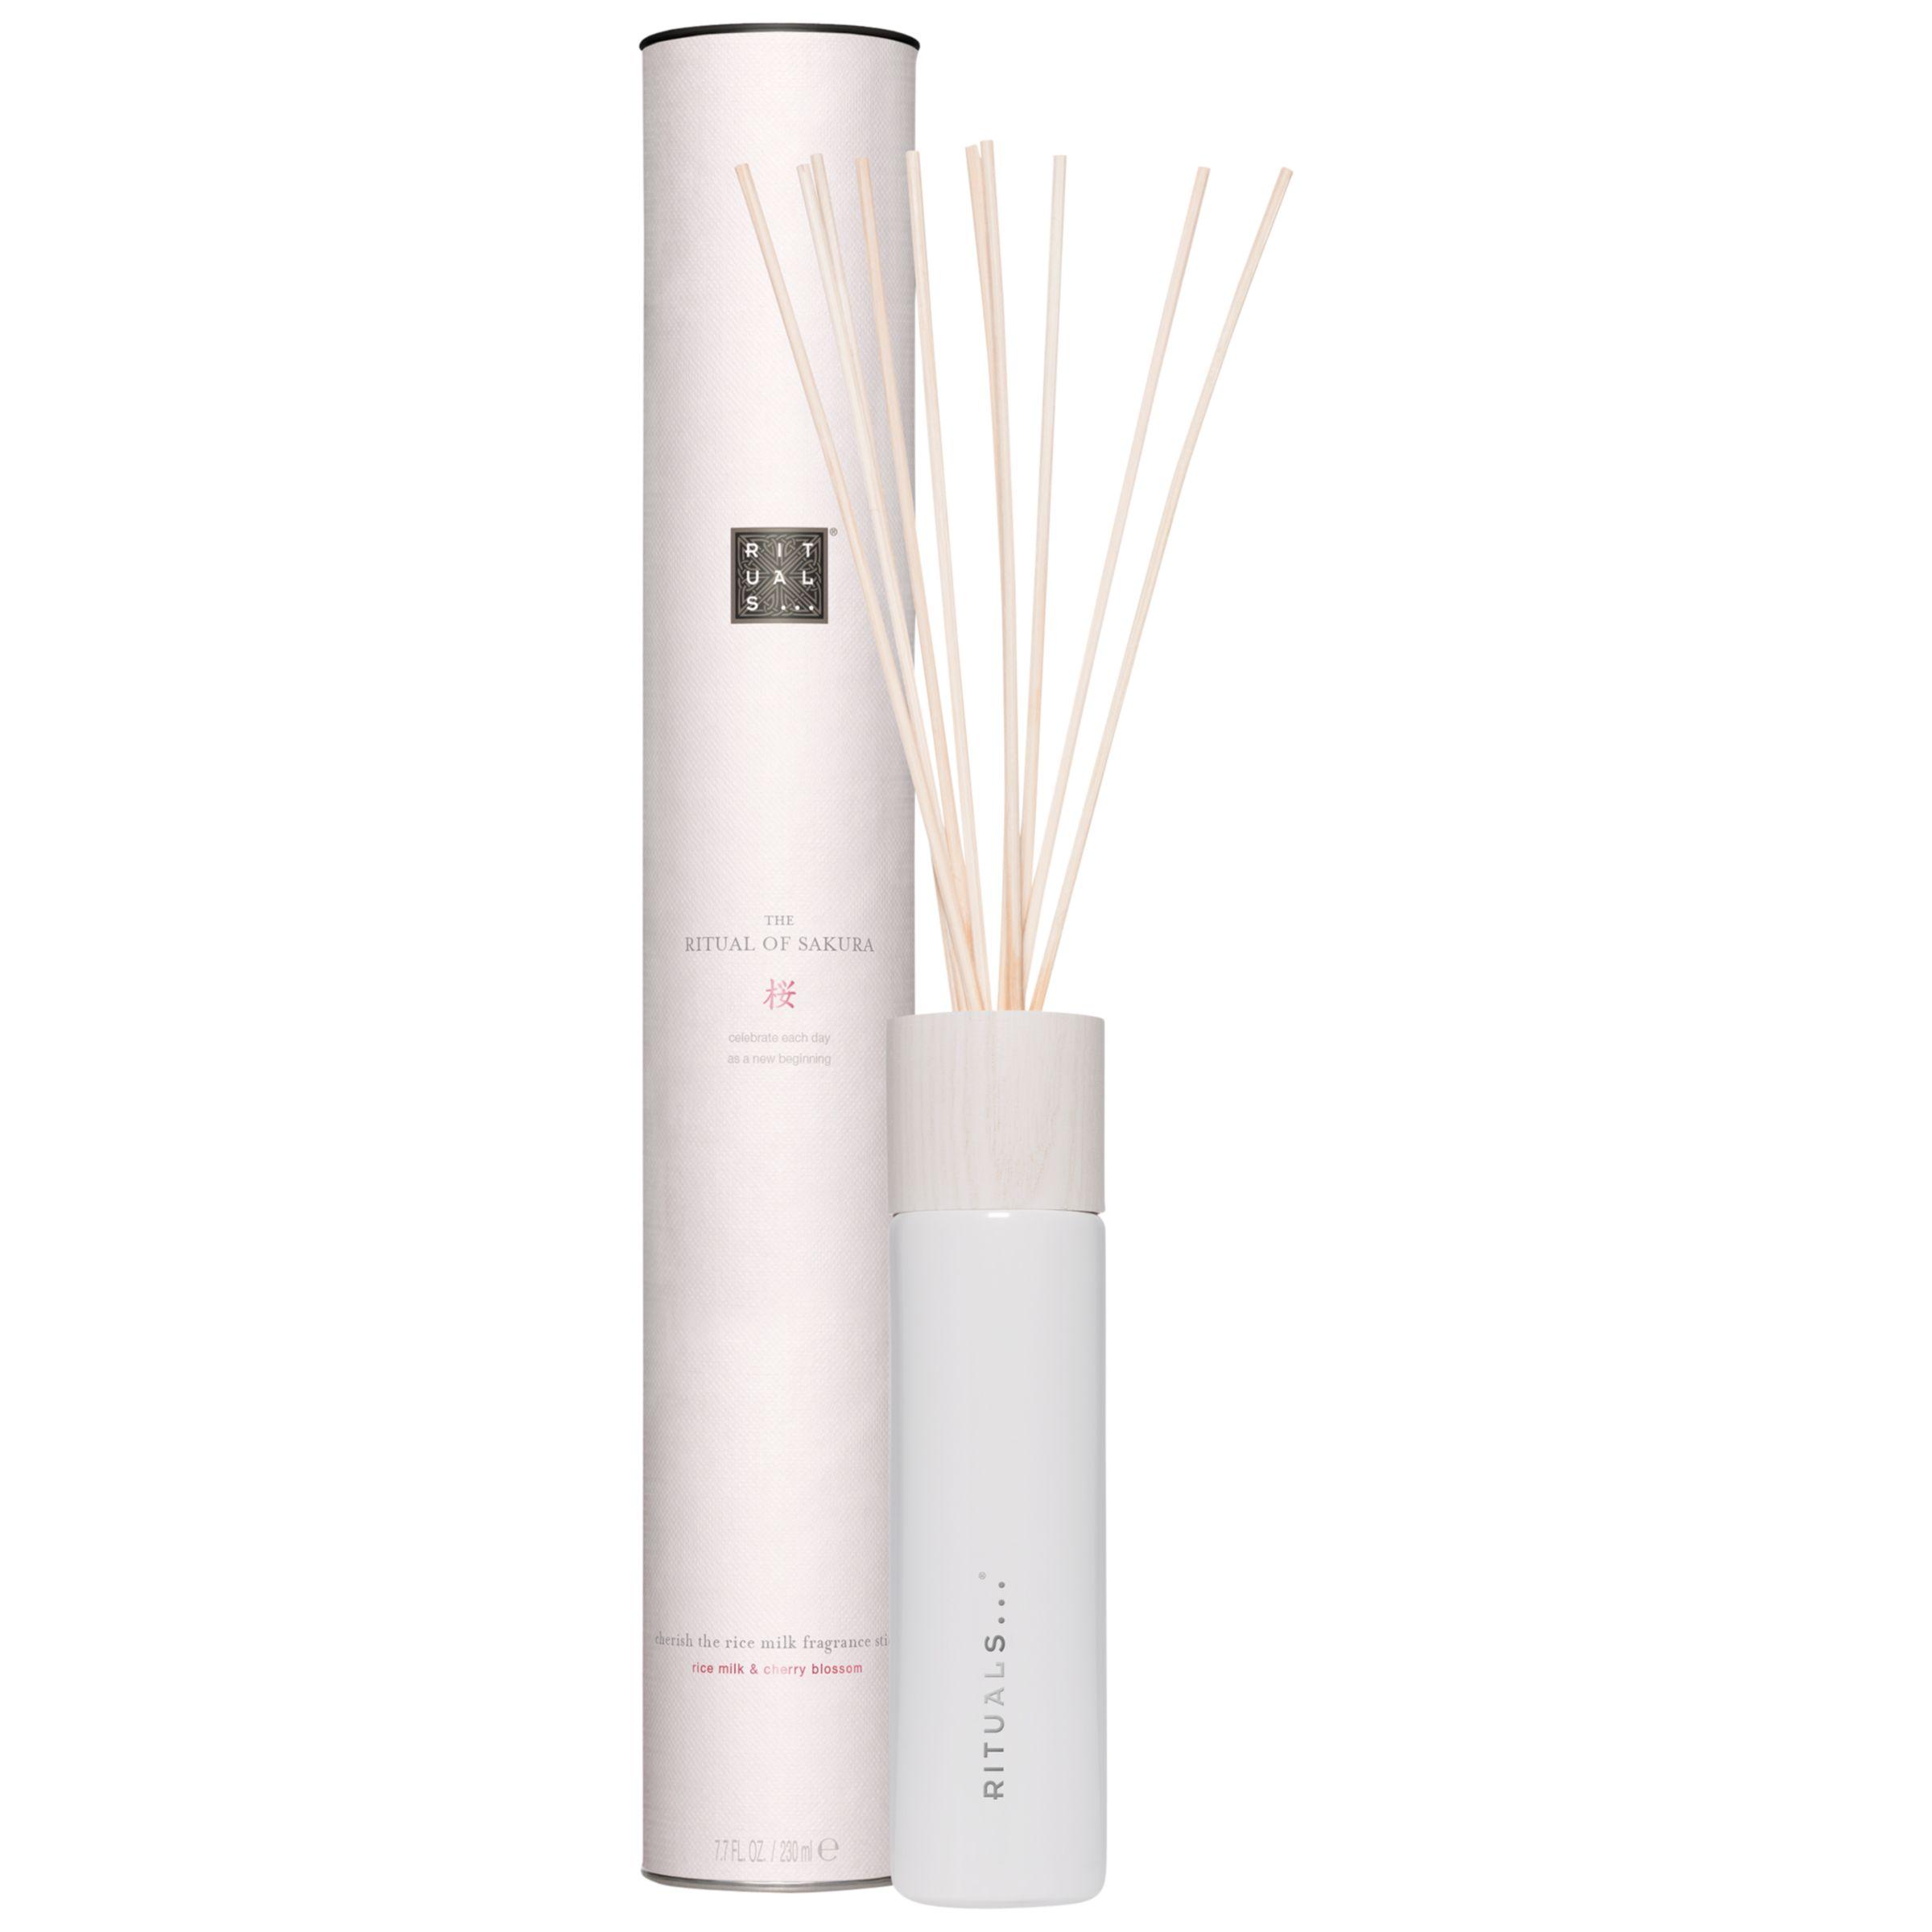 Rituals Rituals The Ritual of Sakura Fragrance Sticks, 230ml